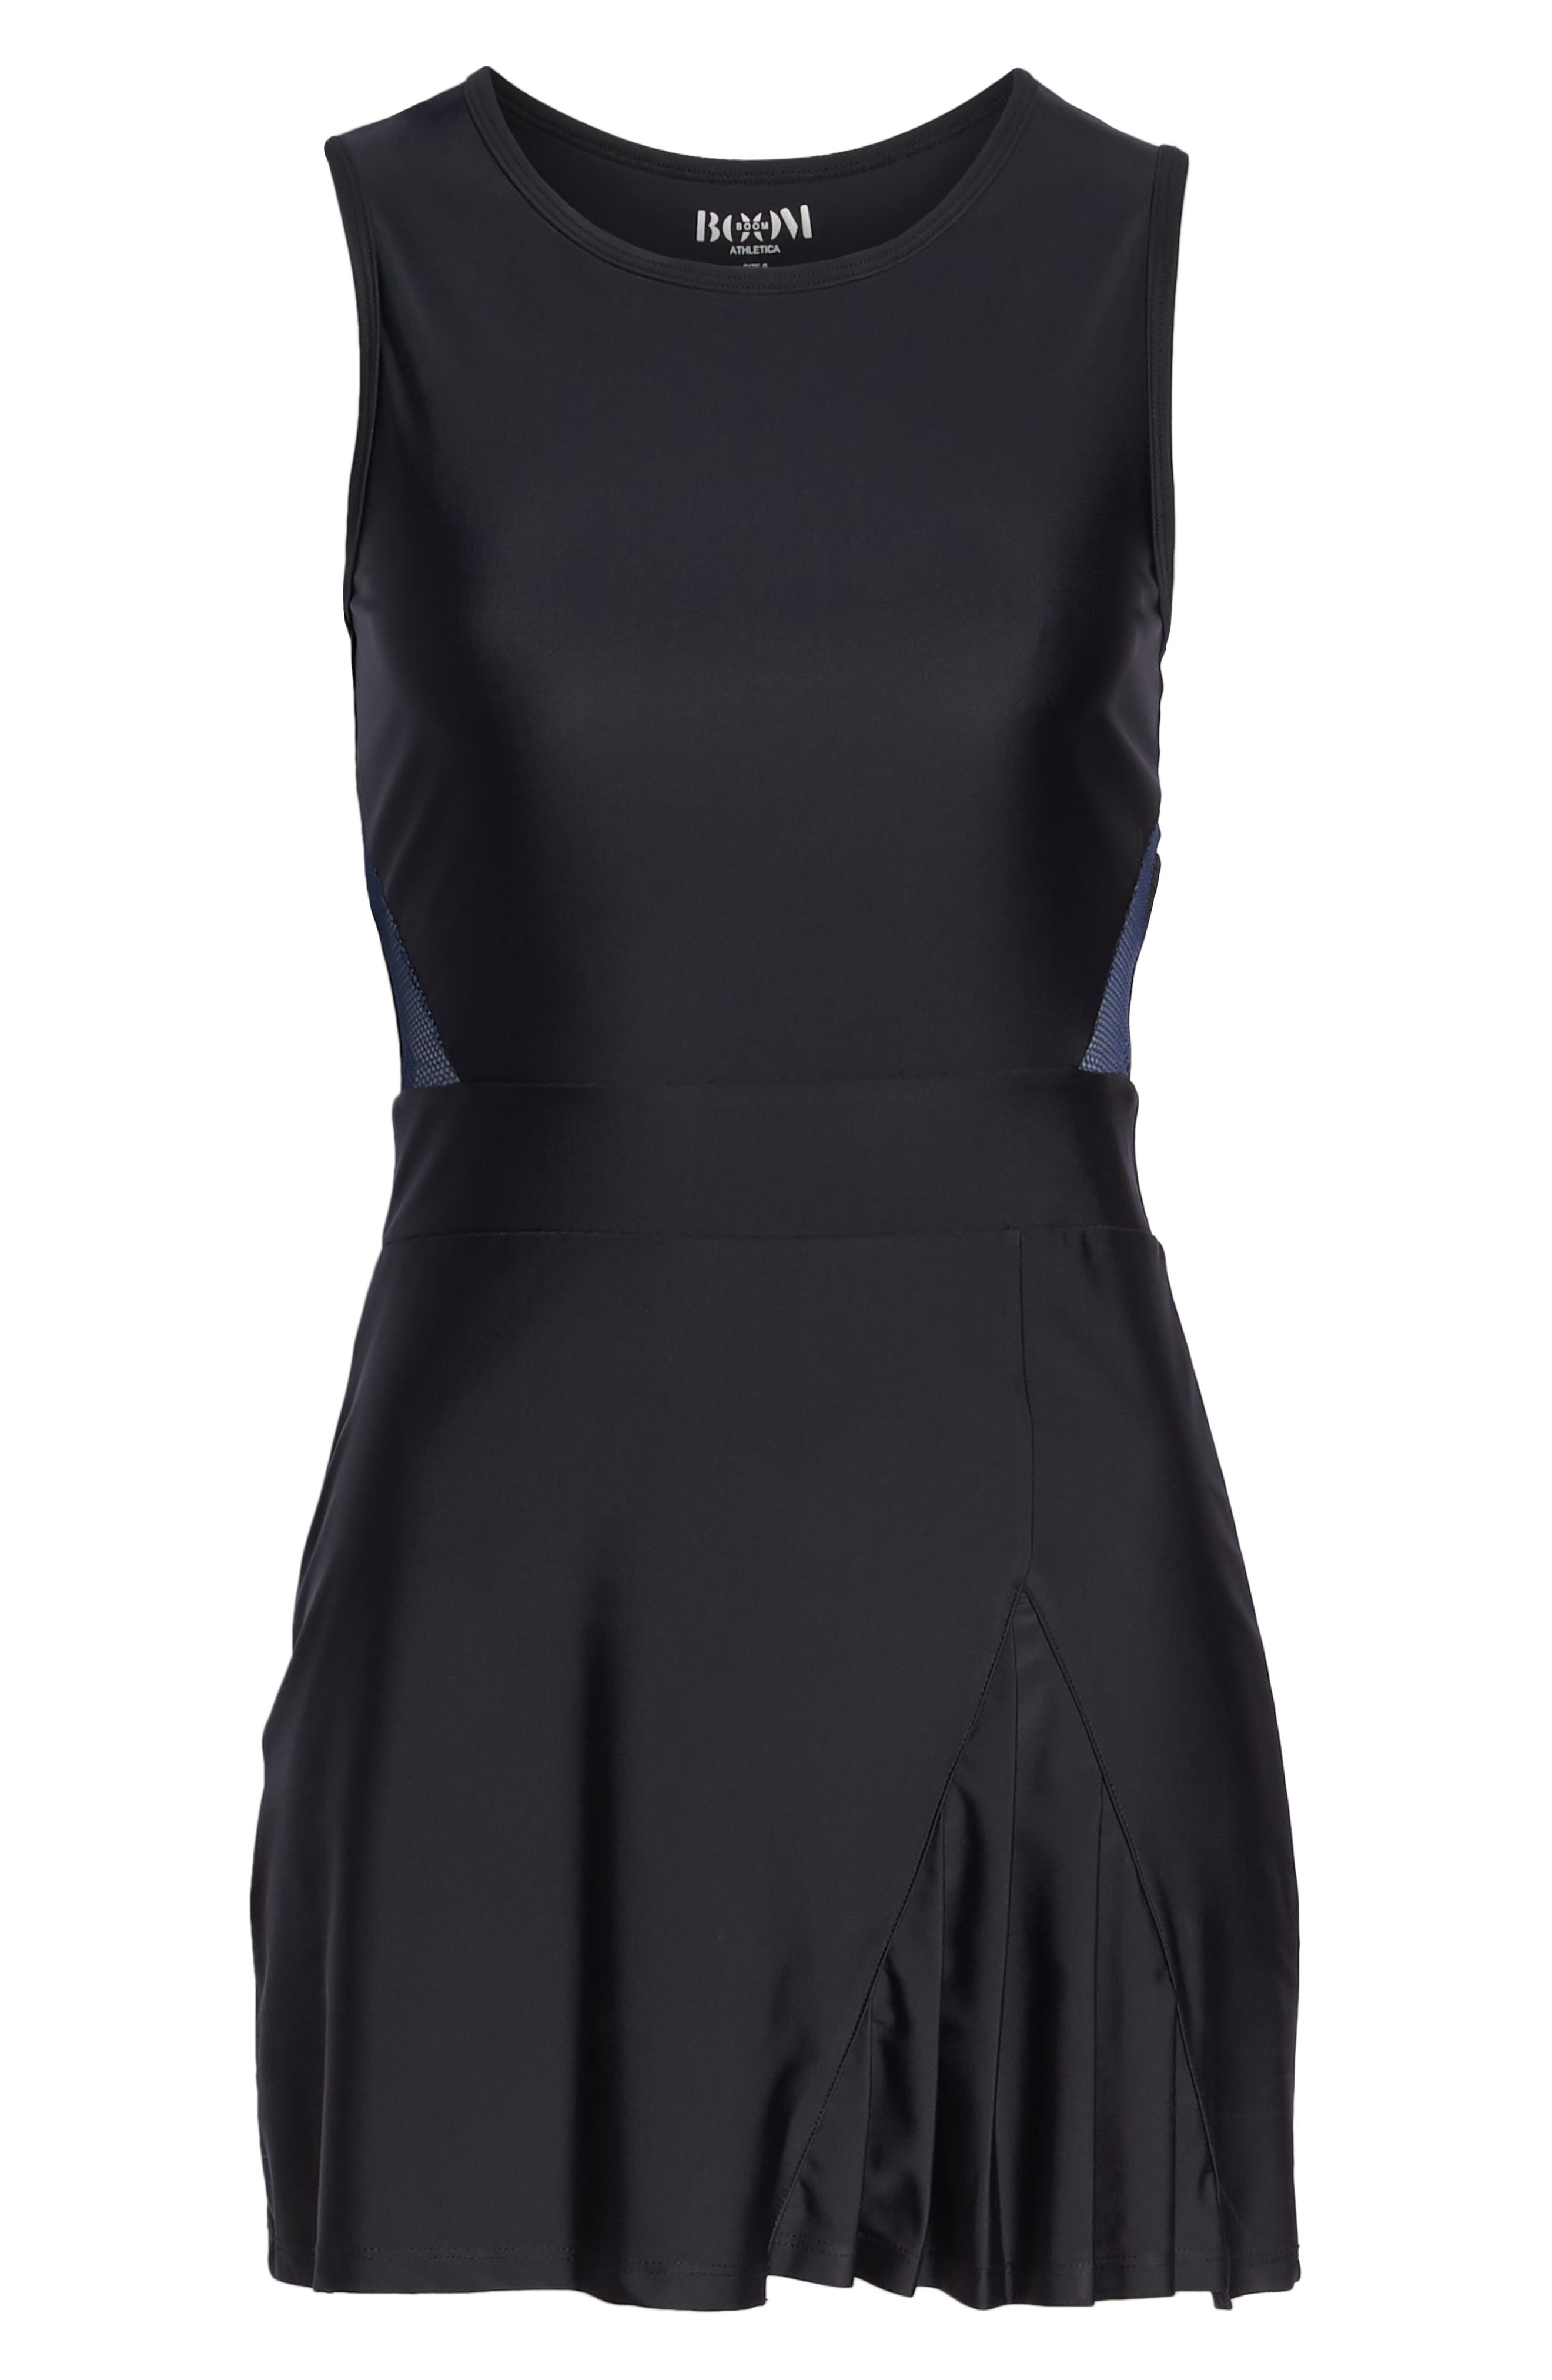 BoomBoom Athletica Tennis Dress,                             Alternate thumbnail 7, color,                             BLACK/ NAVY